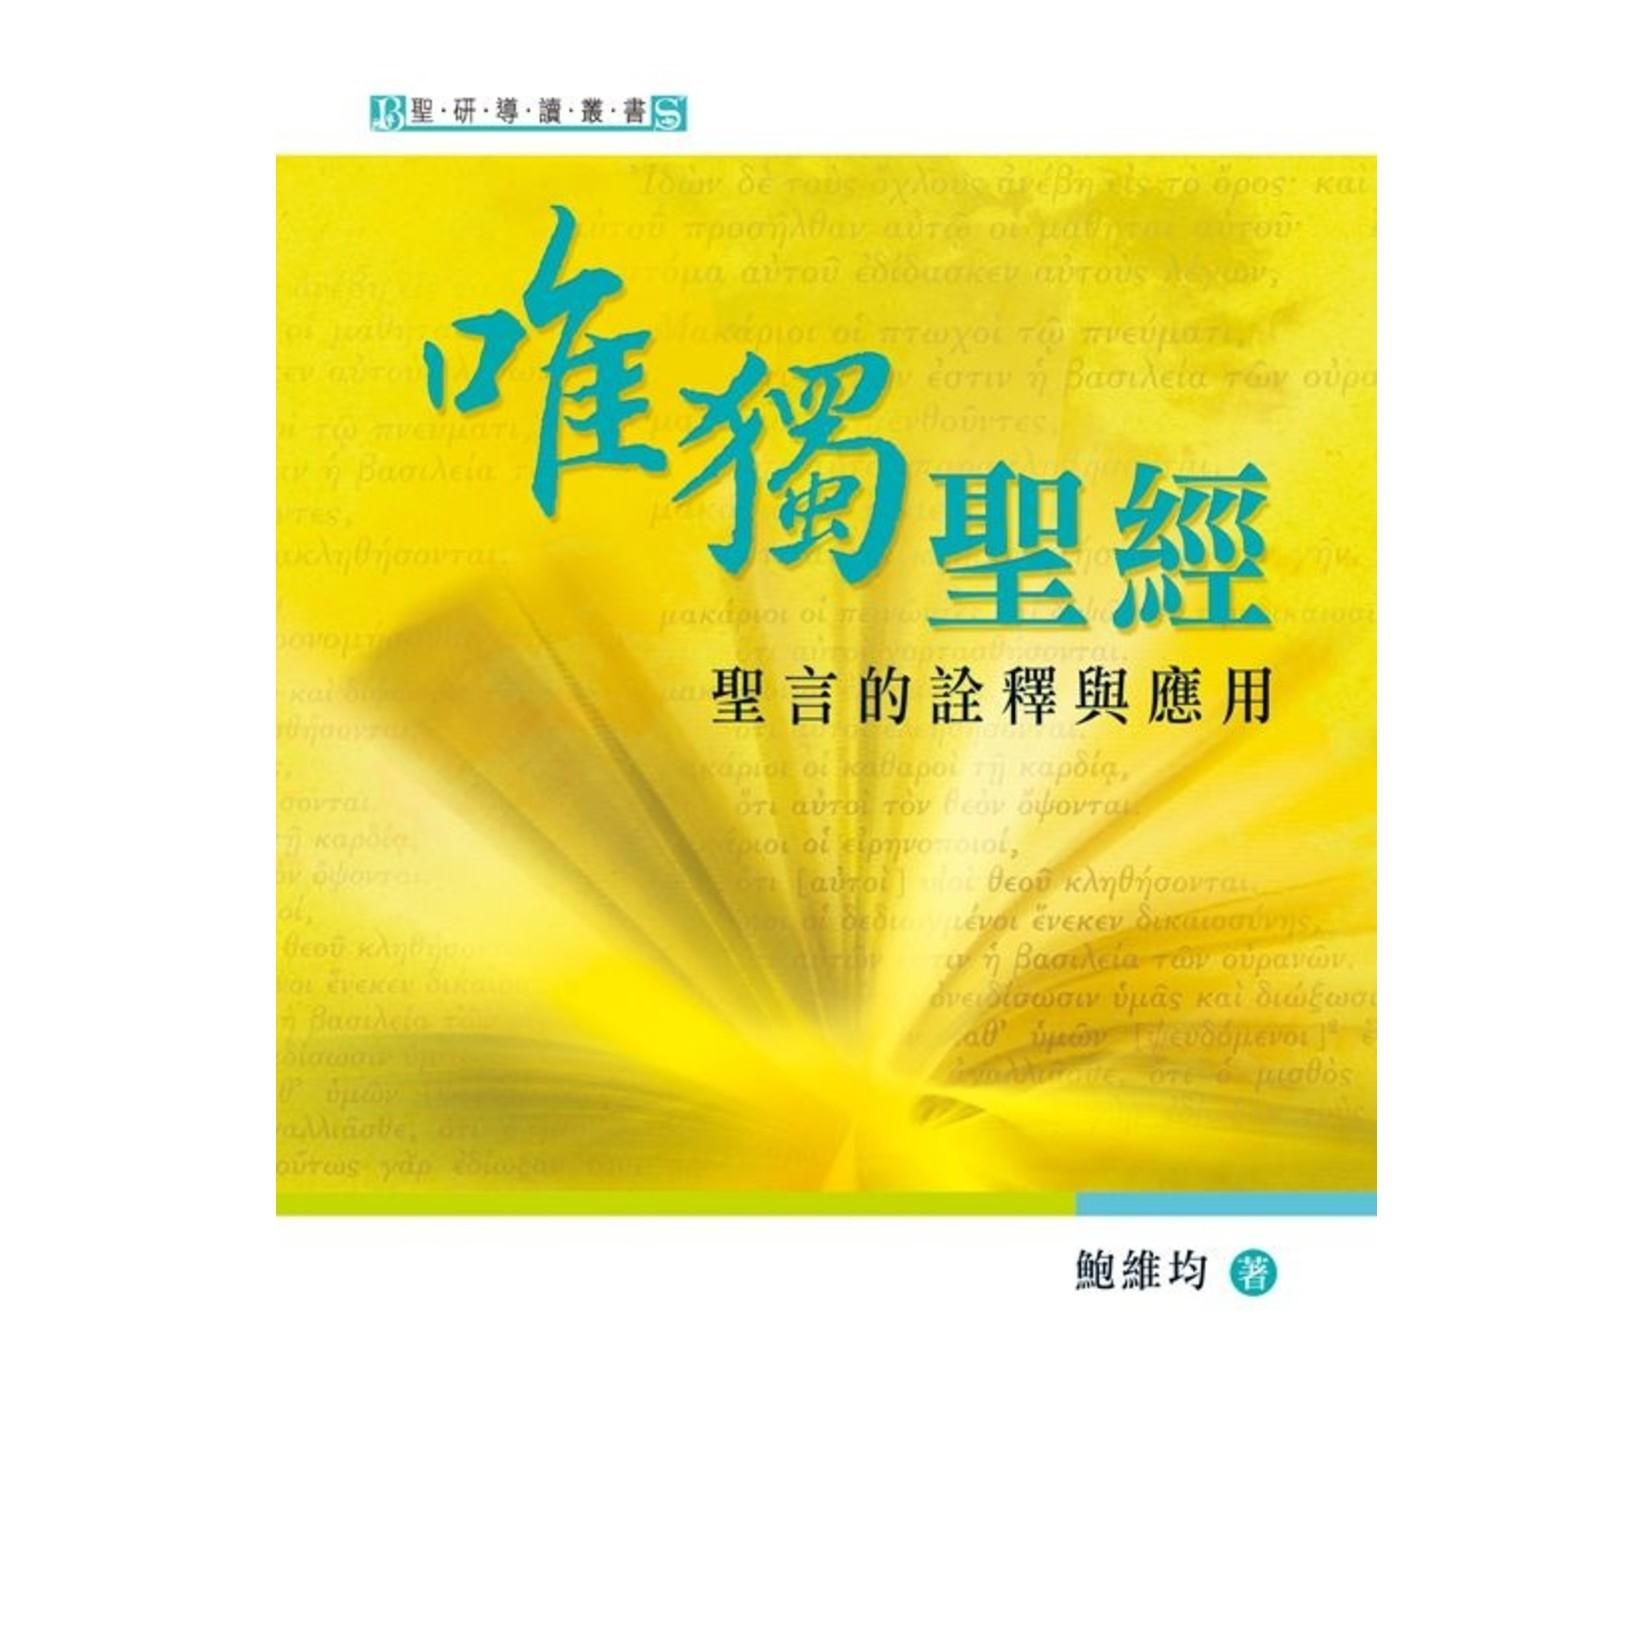 天道書樓 Tien Dao Publishing House 唯獨聖經:聖言的詮釋與應用 Sola Scriptura: From Interpretation to Application